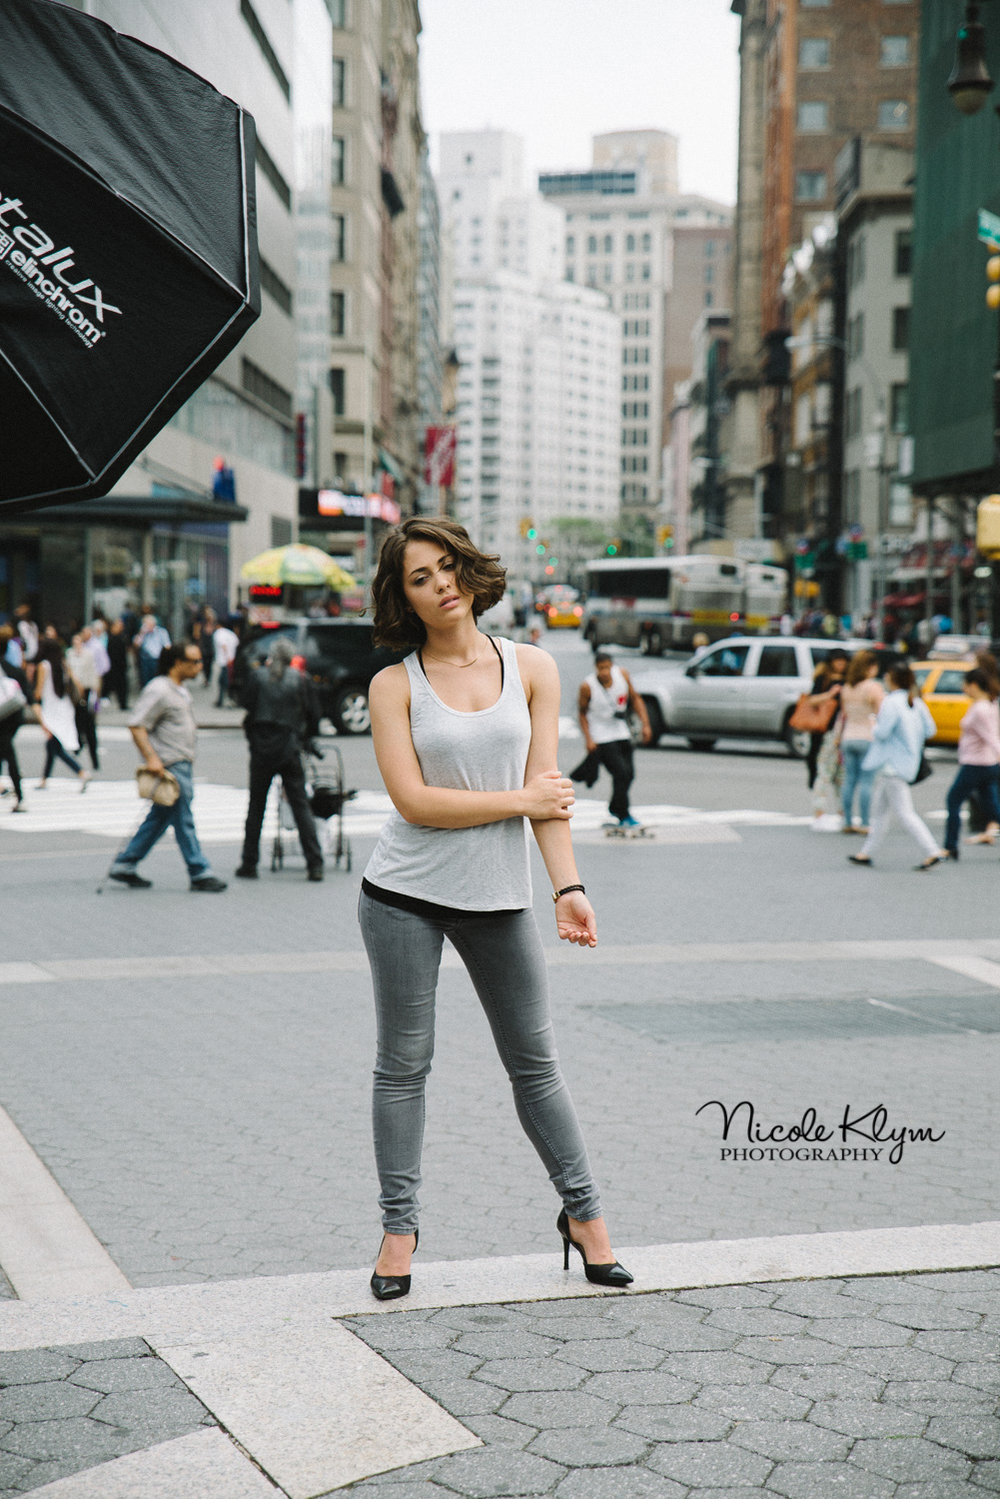 NYC Photography Workshop Nicole Klym Photography